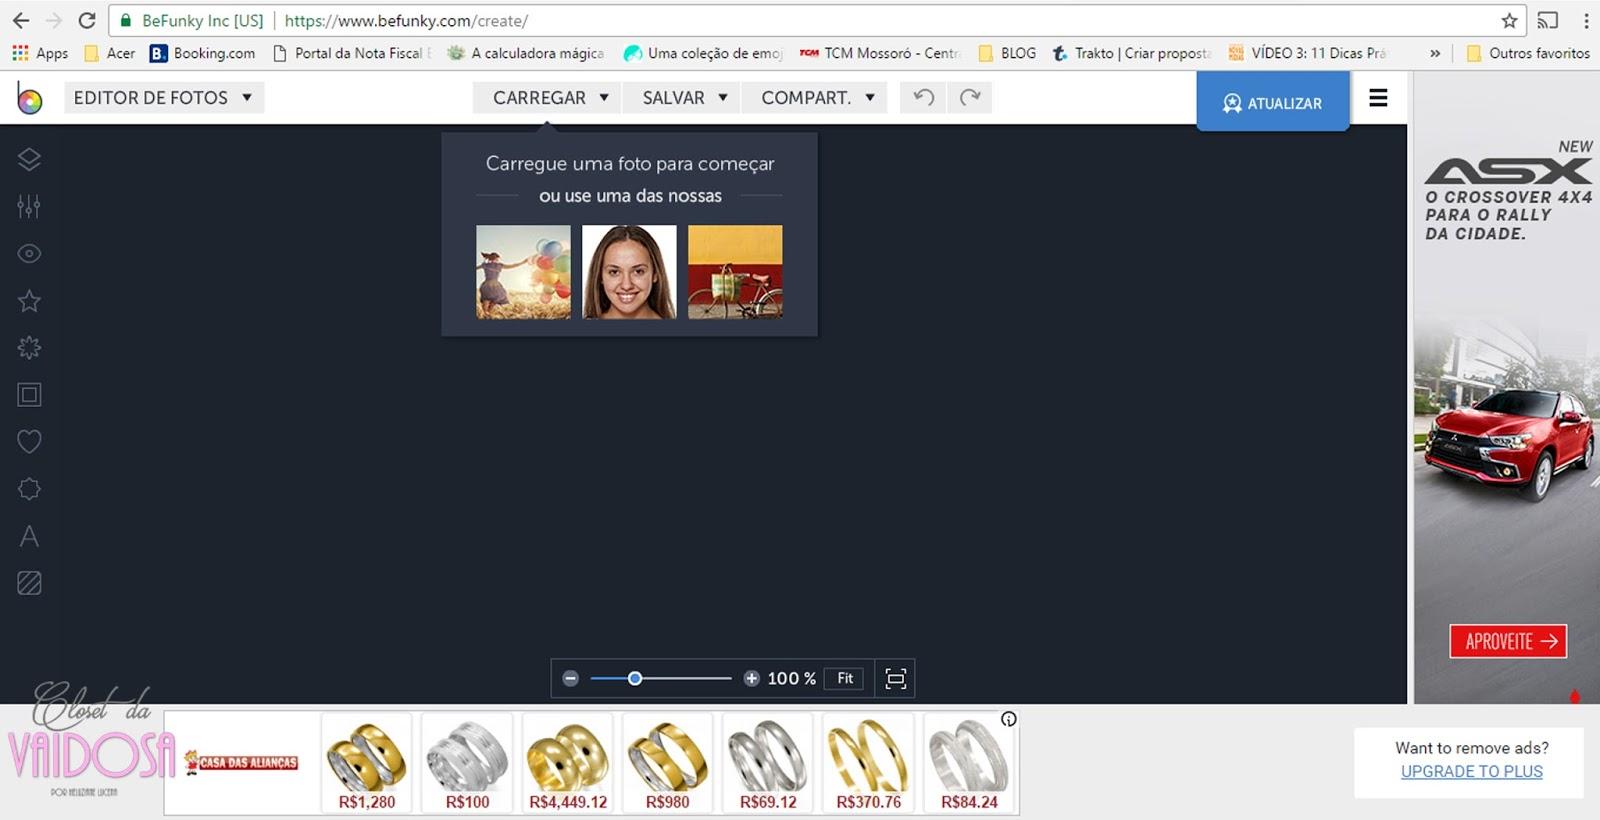 Closet Da Vaidosa Meus Aplicativos Programas E Sites